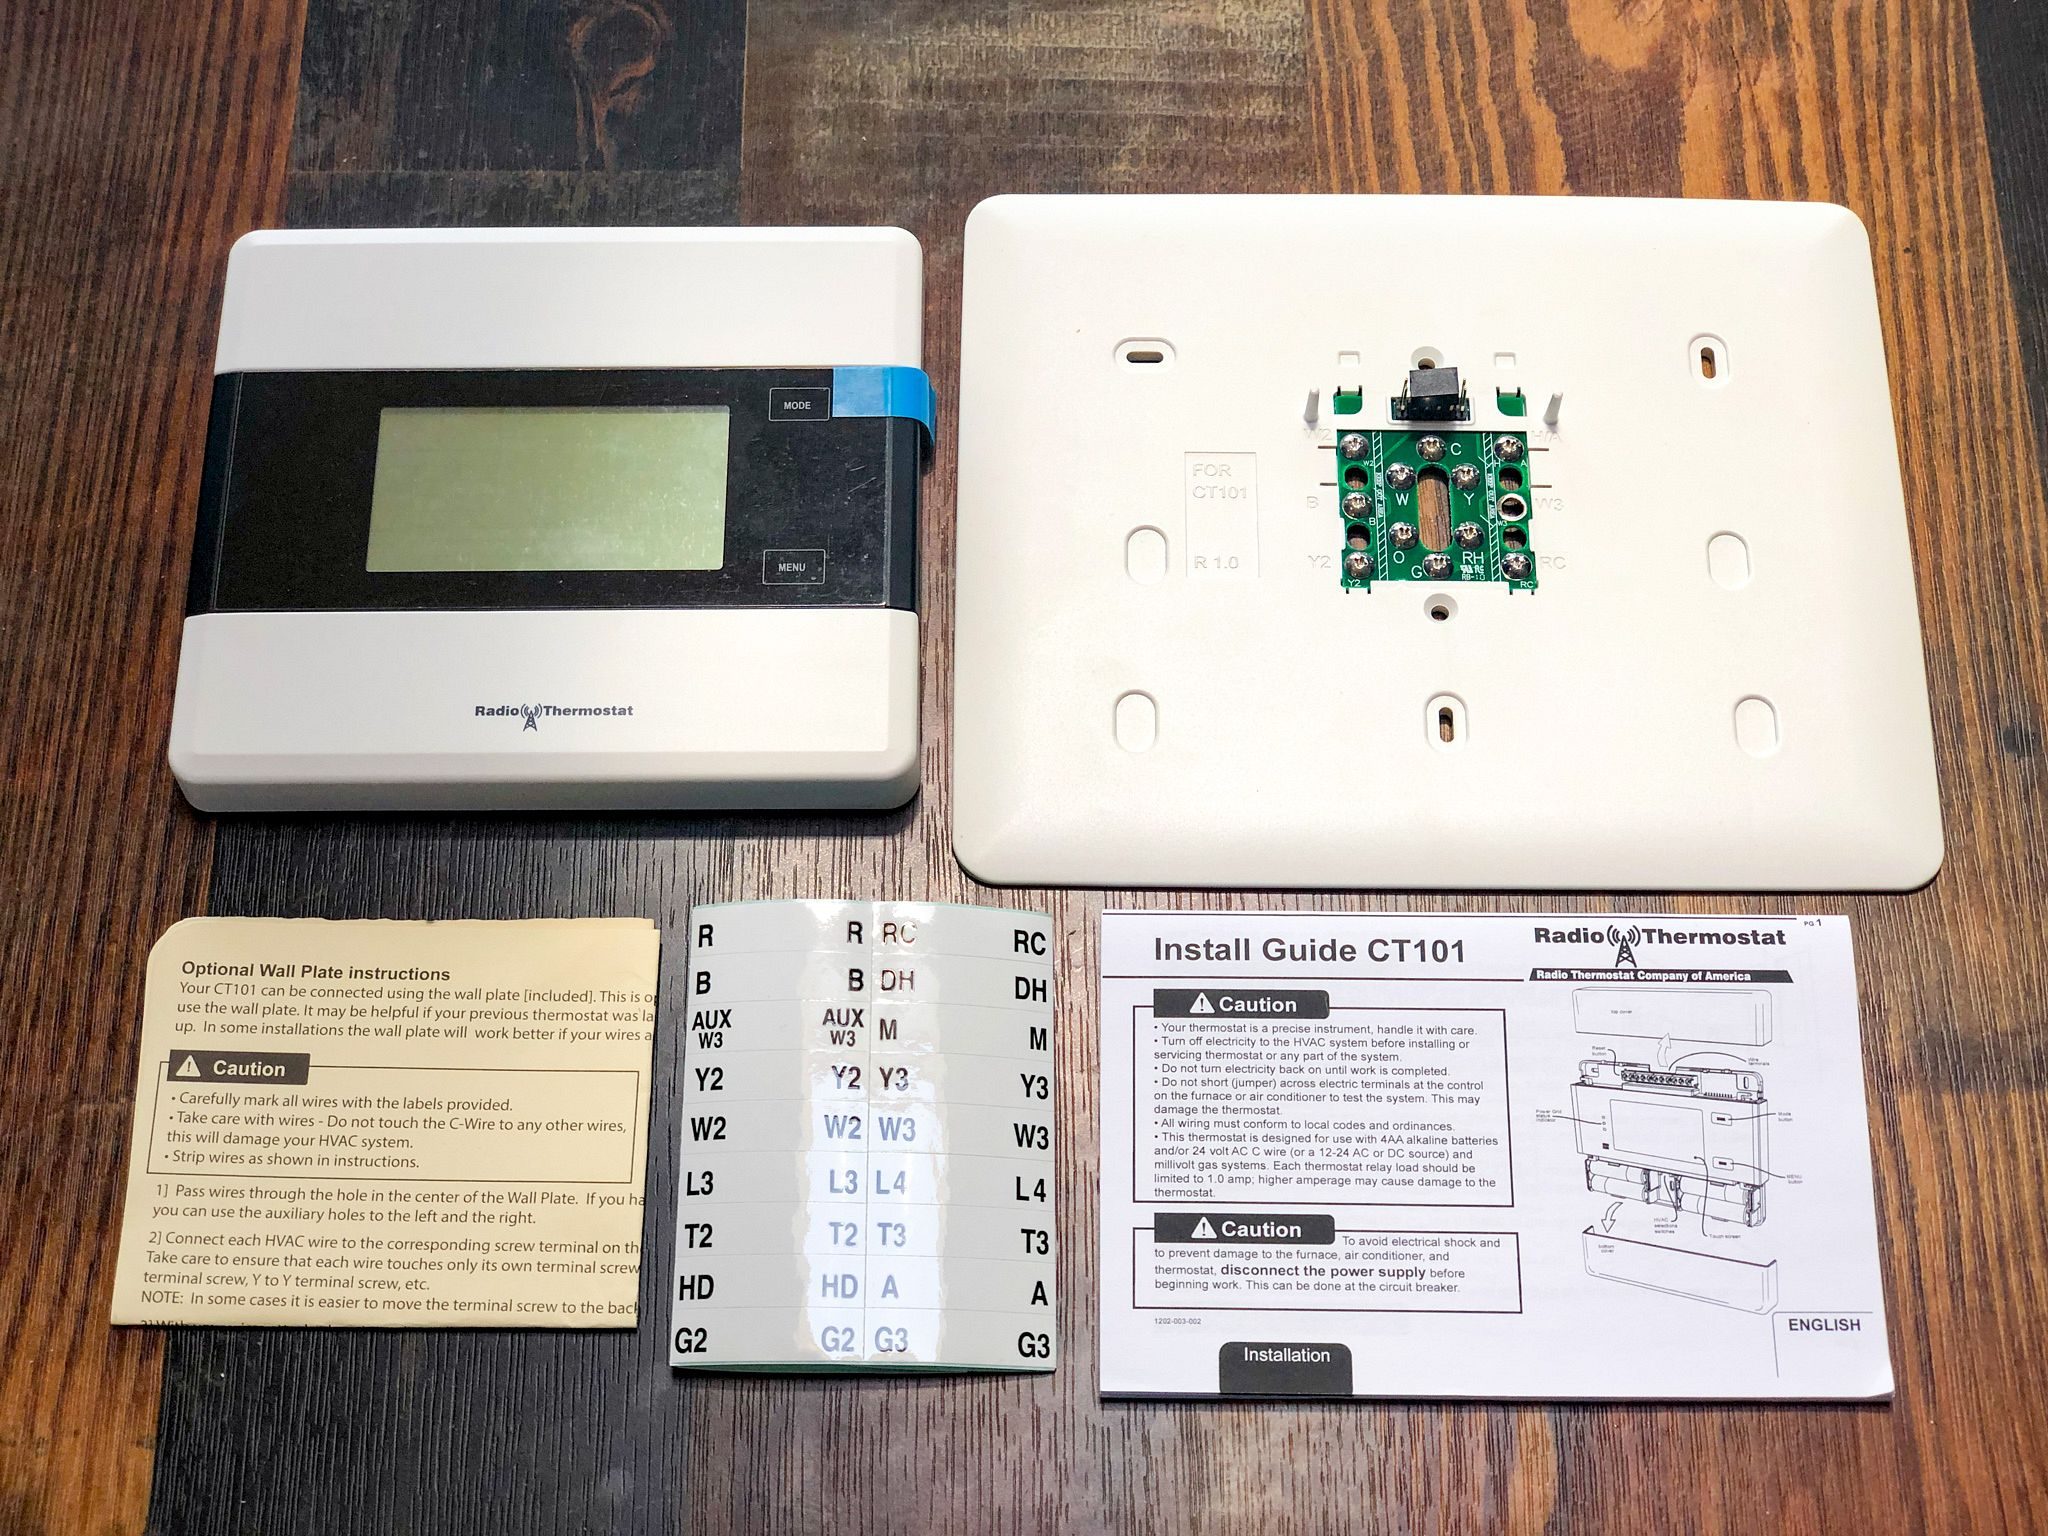 Radio Thermostat CT101